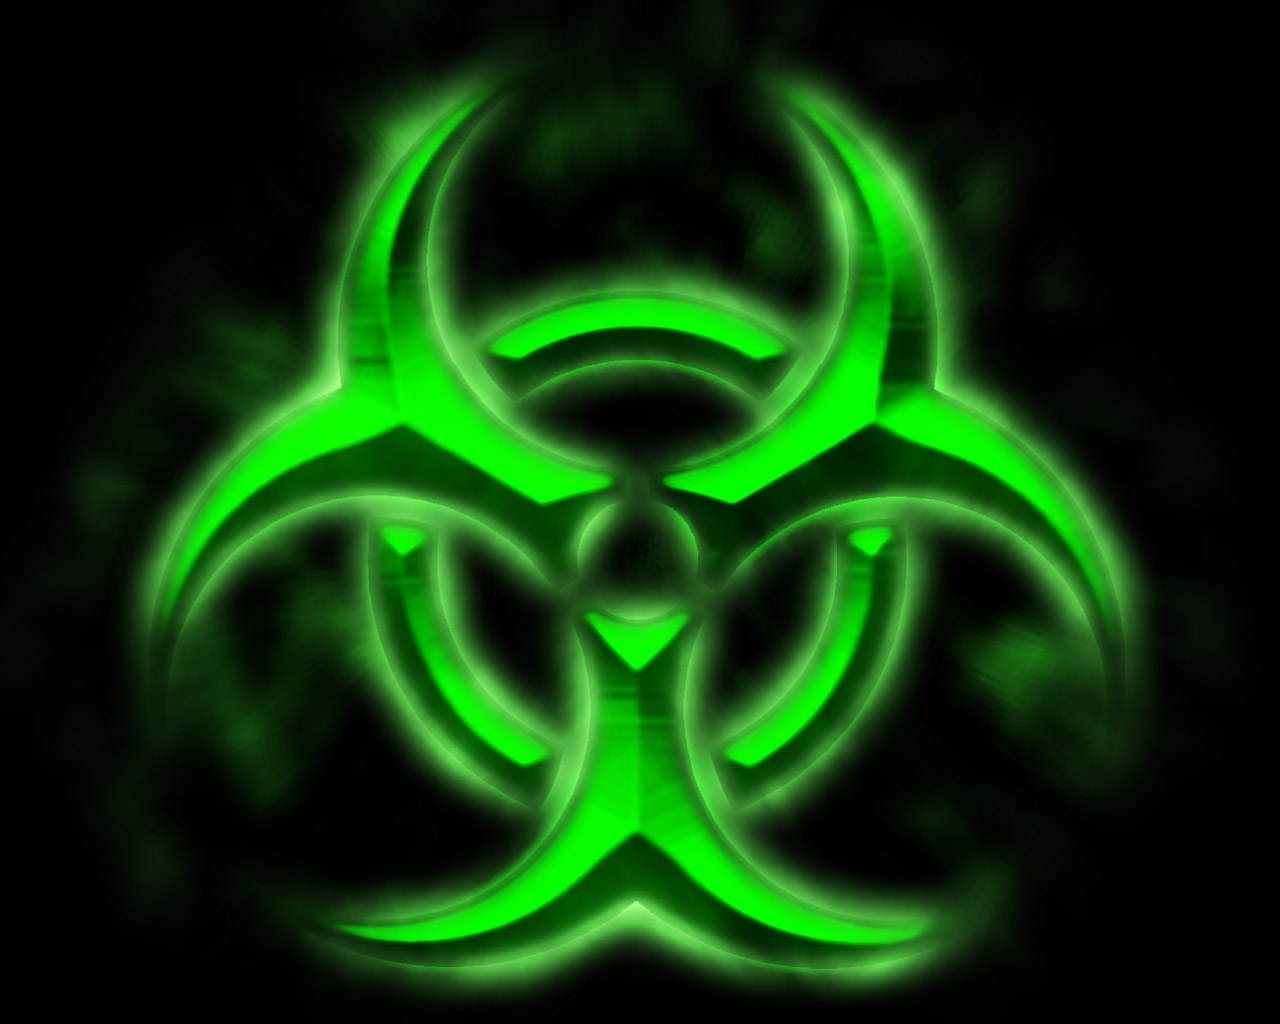 Green Biohazard by Major-Casualtie on DeviantArt